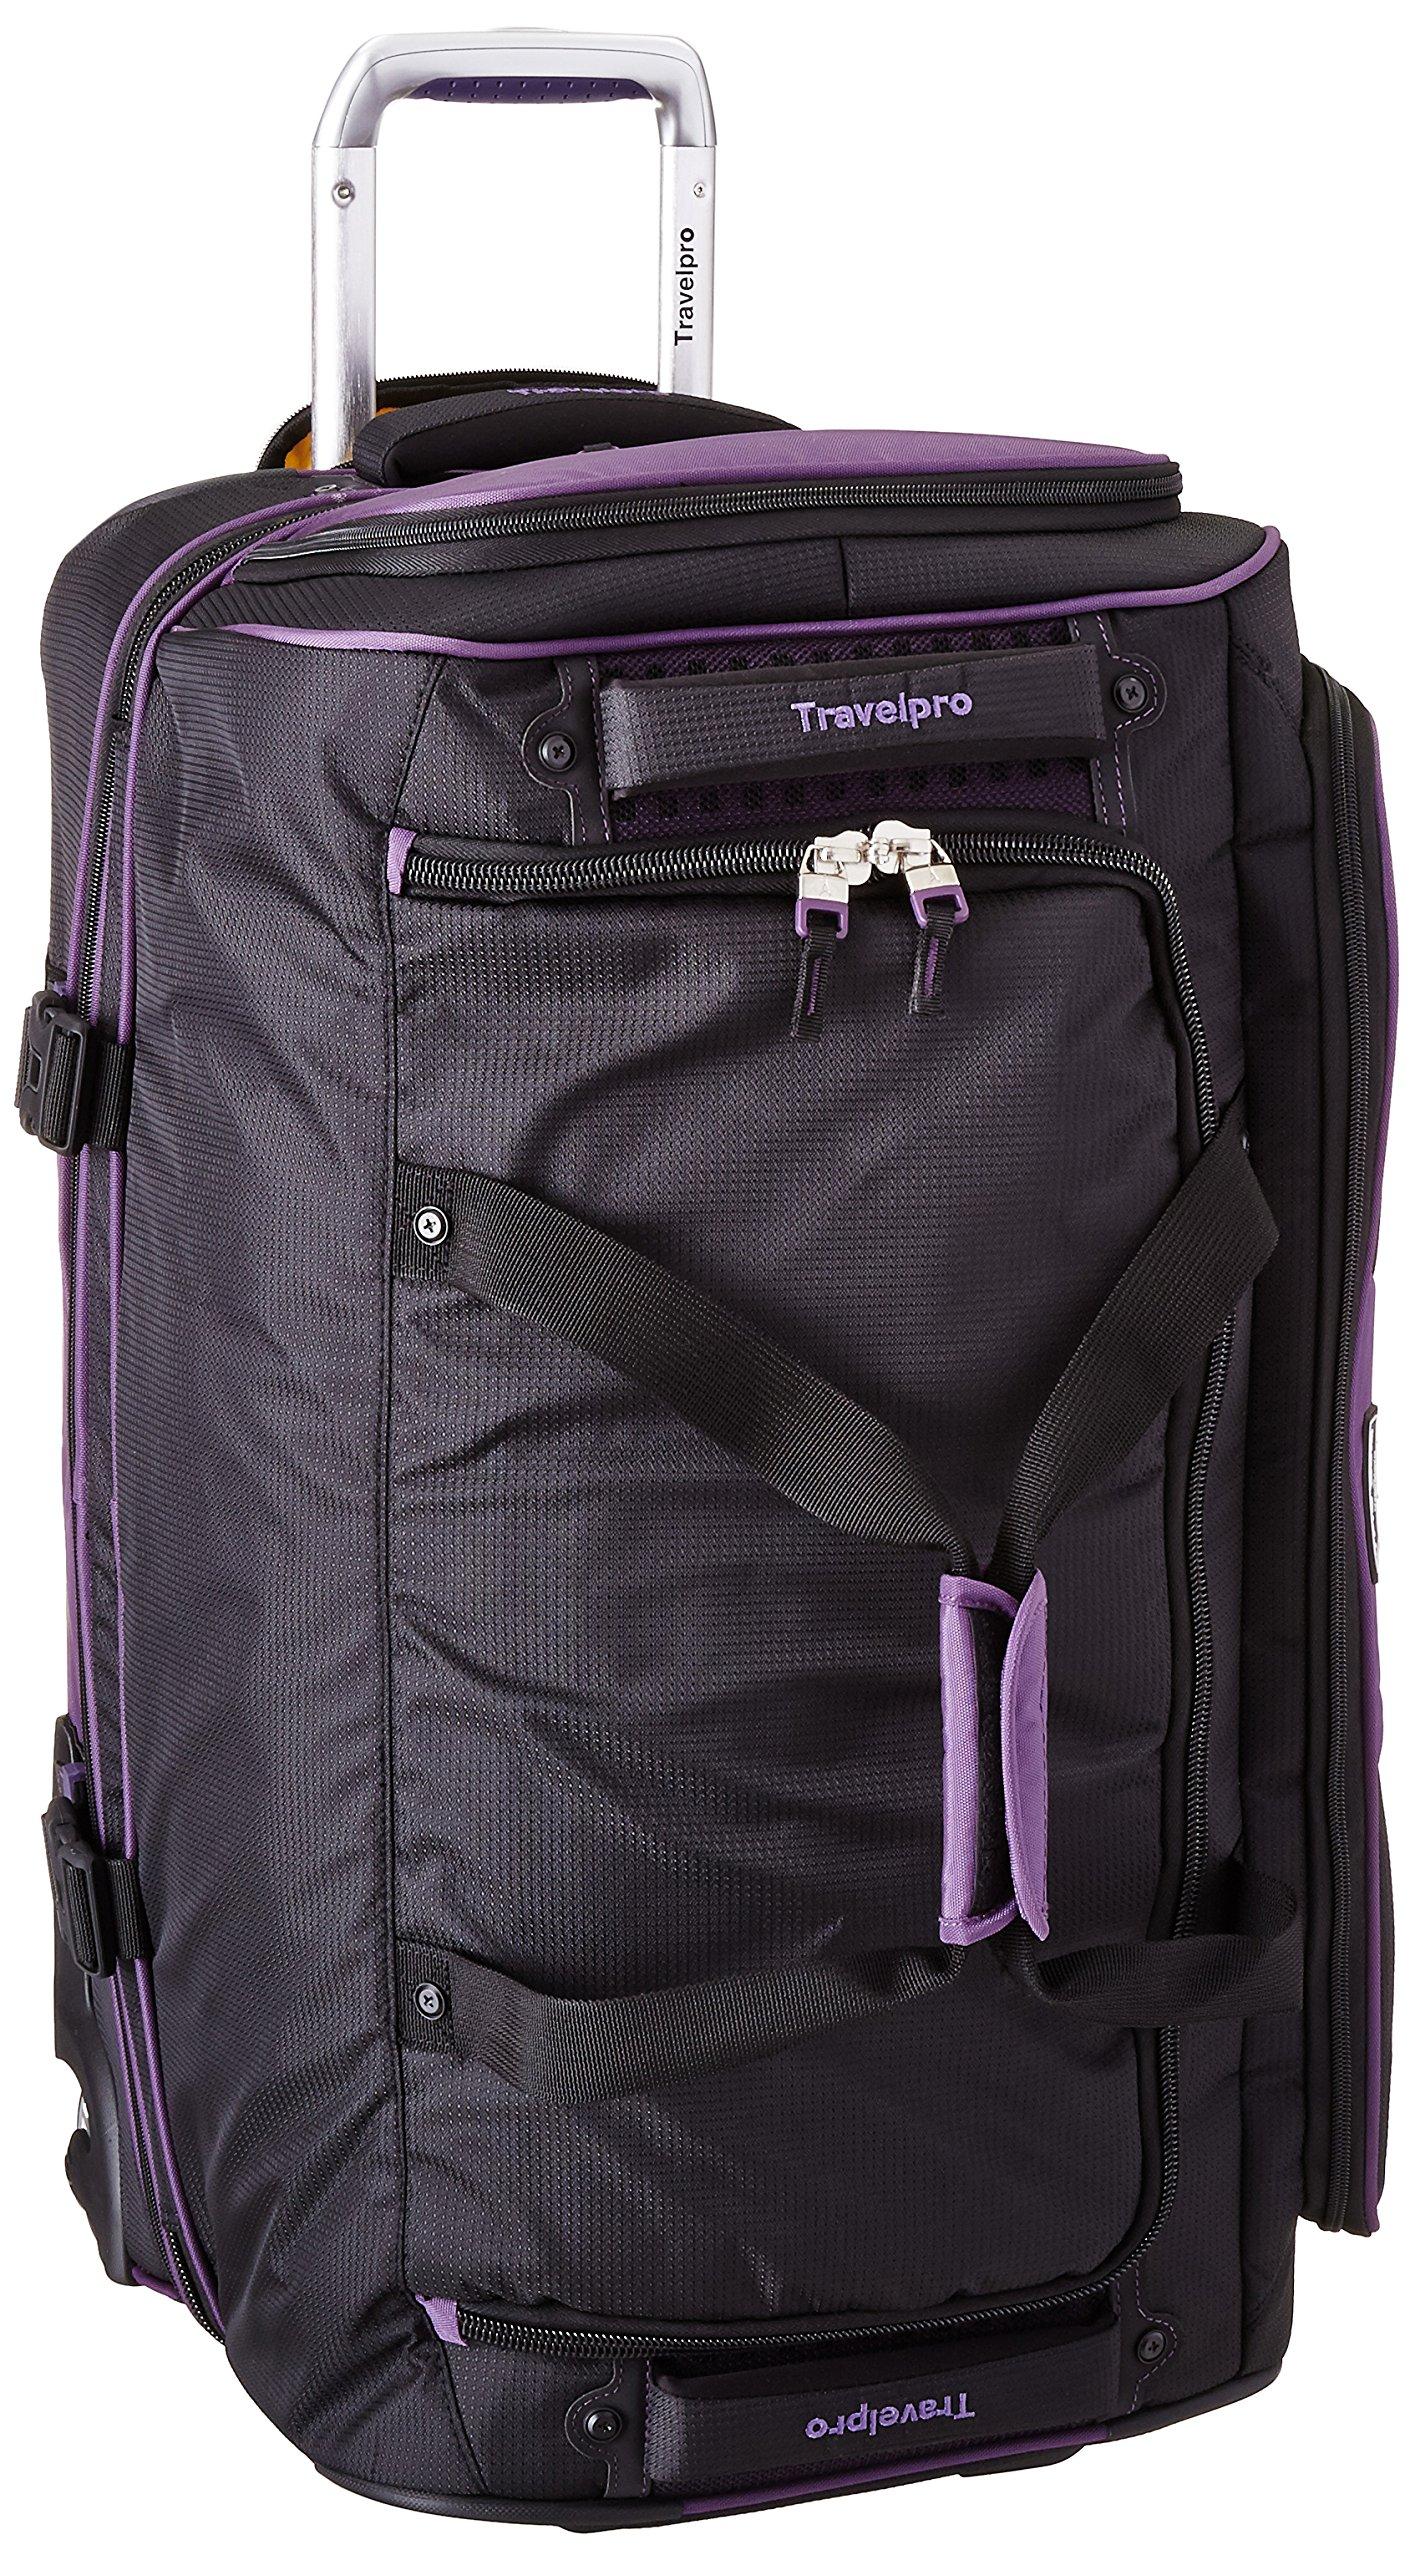 Travelpro Tpro Bold 2.0 26 Inch Drop Bottom Rolling Duffel, Black/Purple, One Size